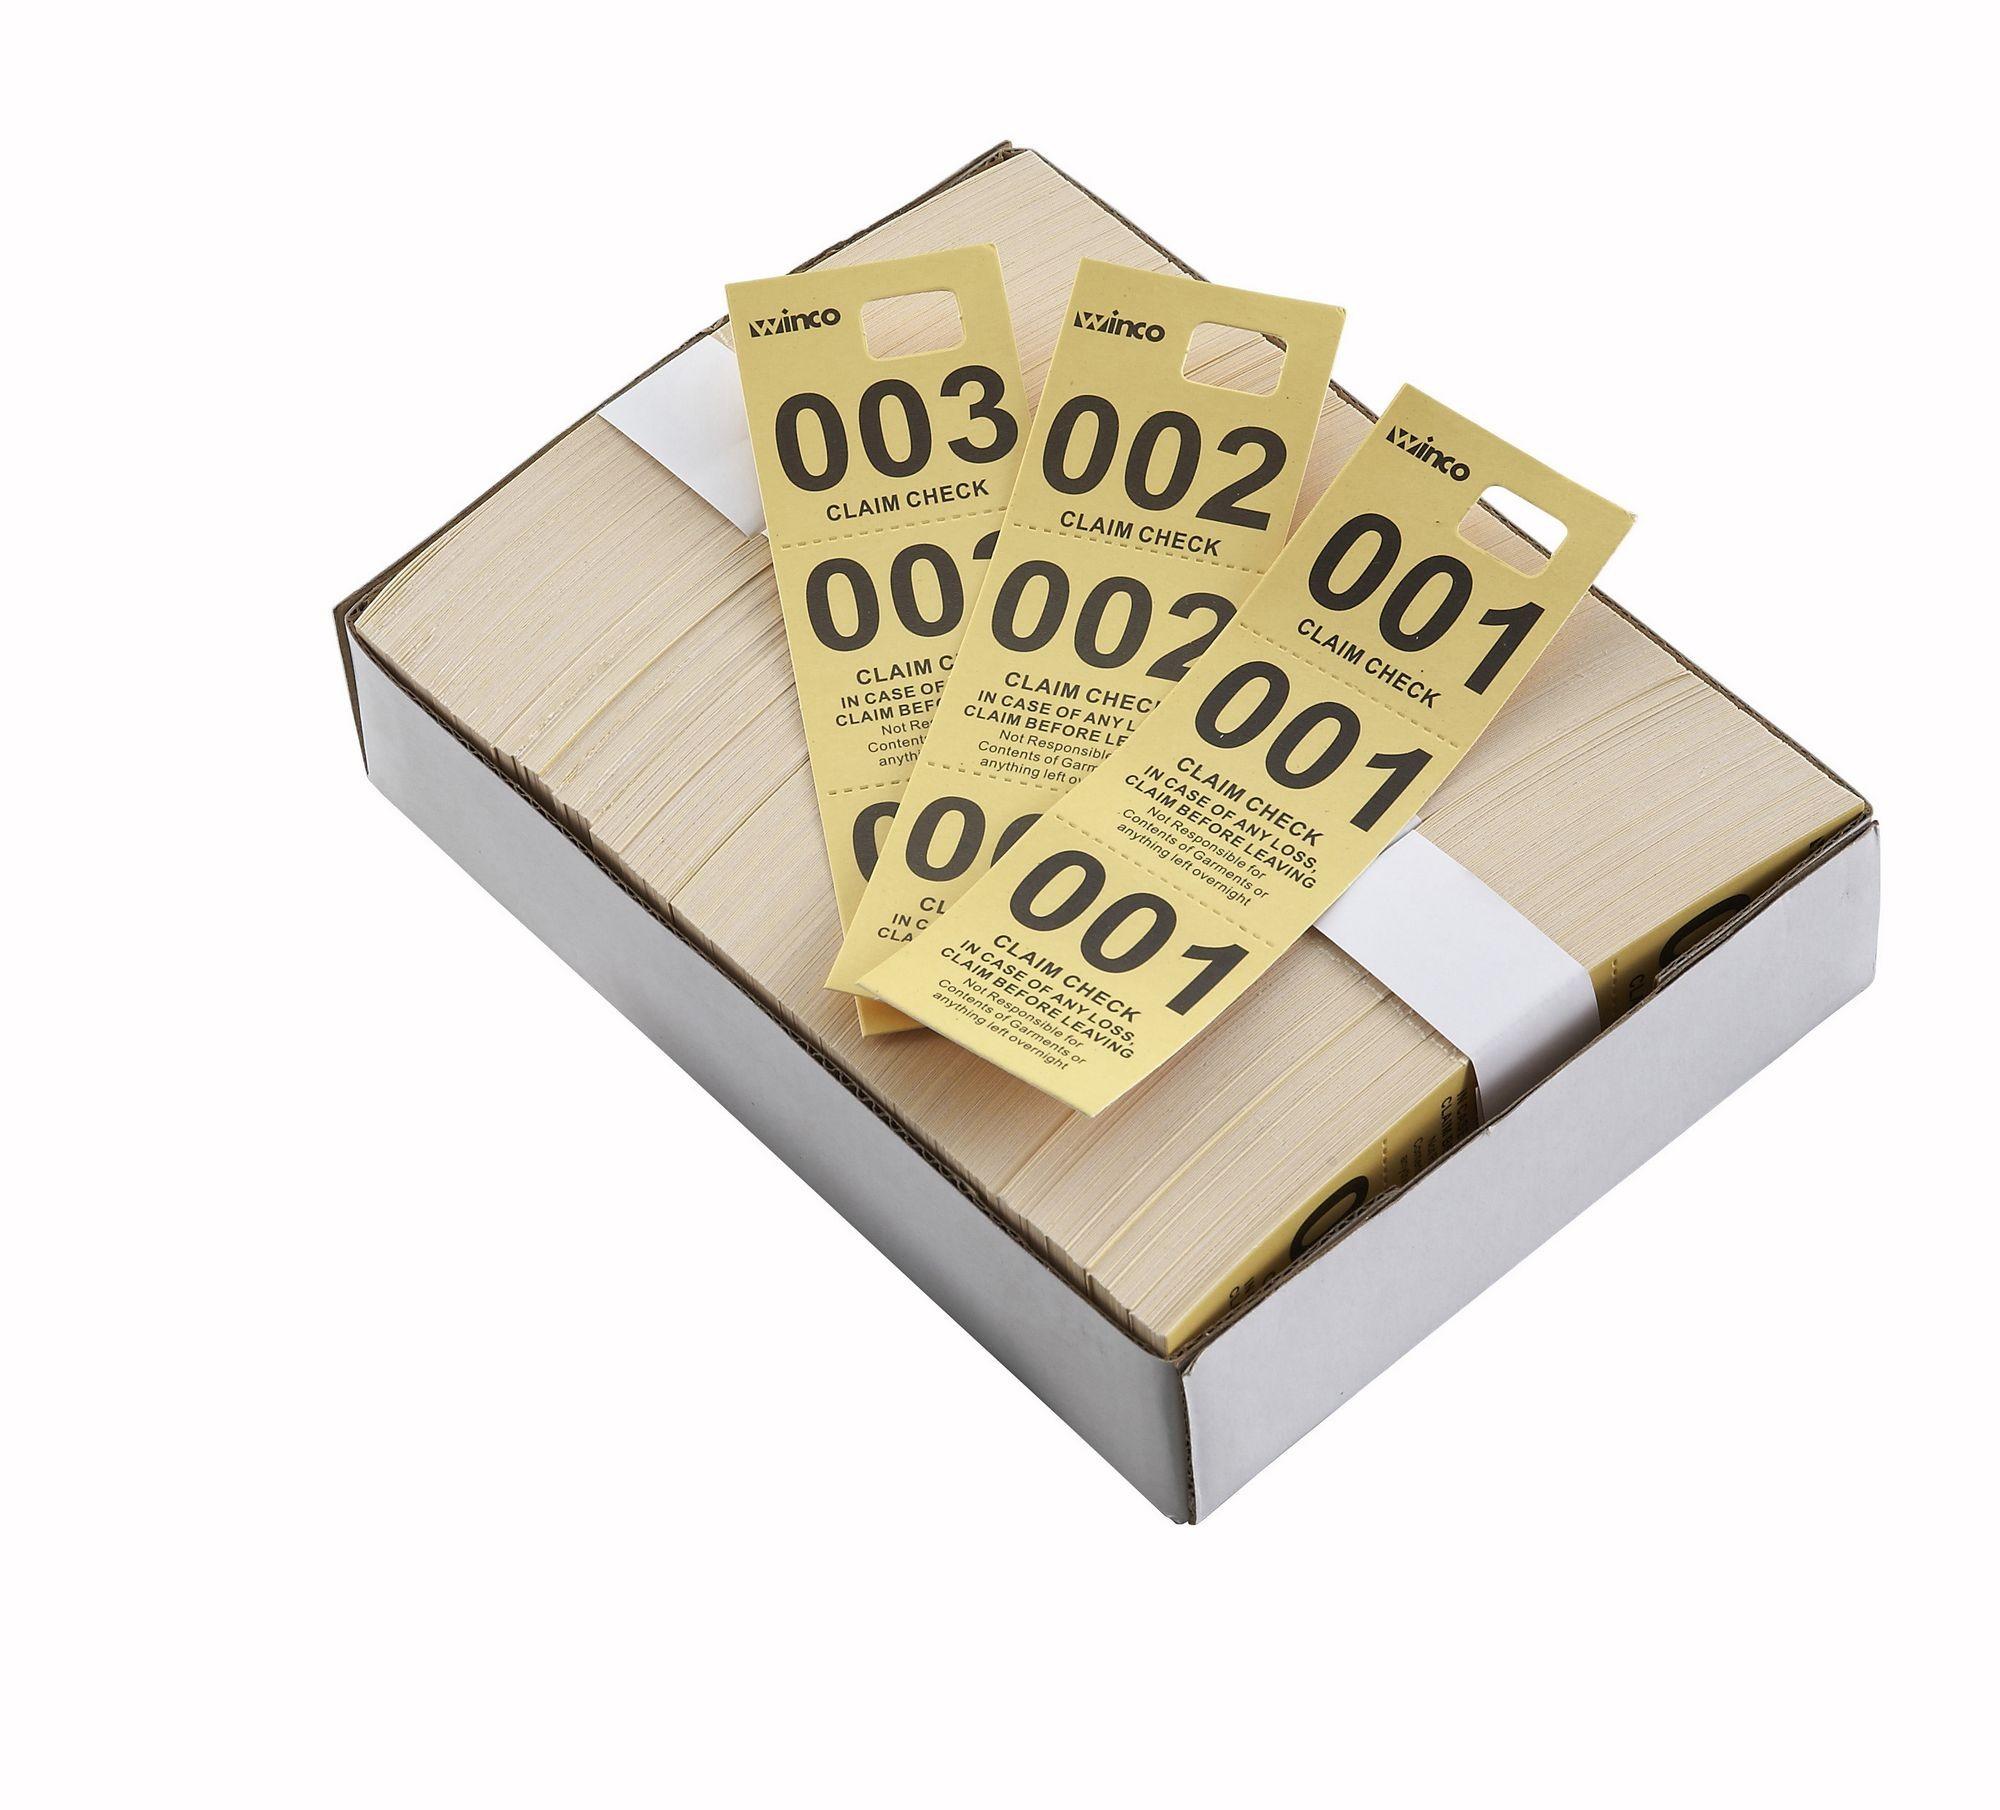 Winco CCK-5YL Yellow Coat Check Tags (500 Pieces per Box) - LionsDeal